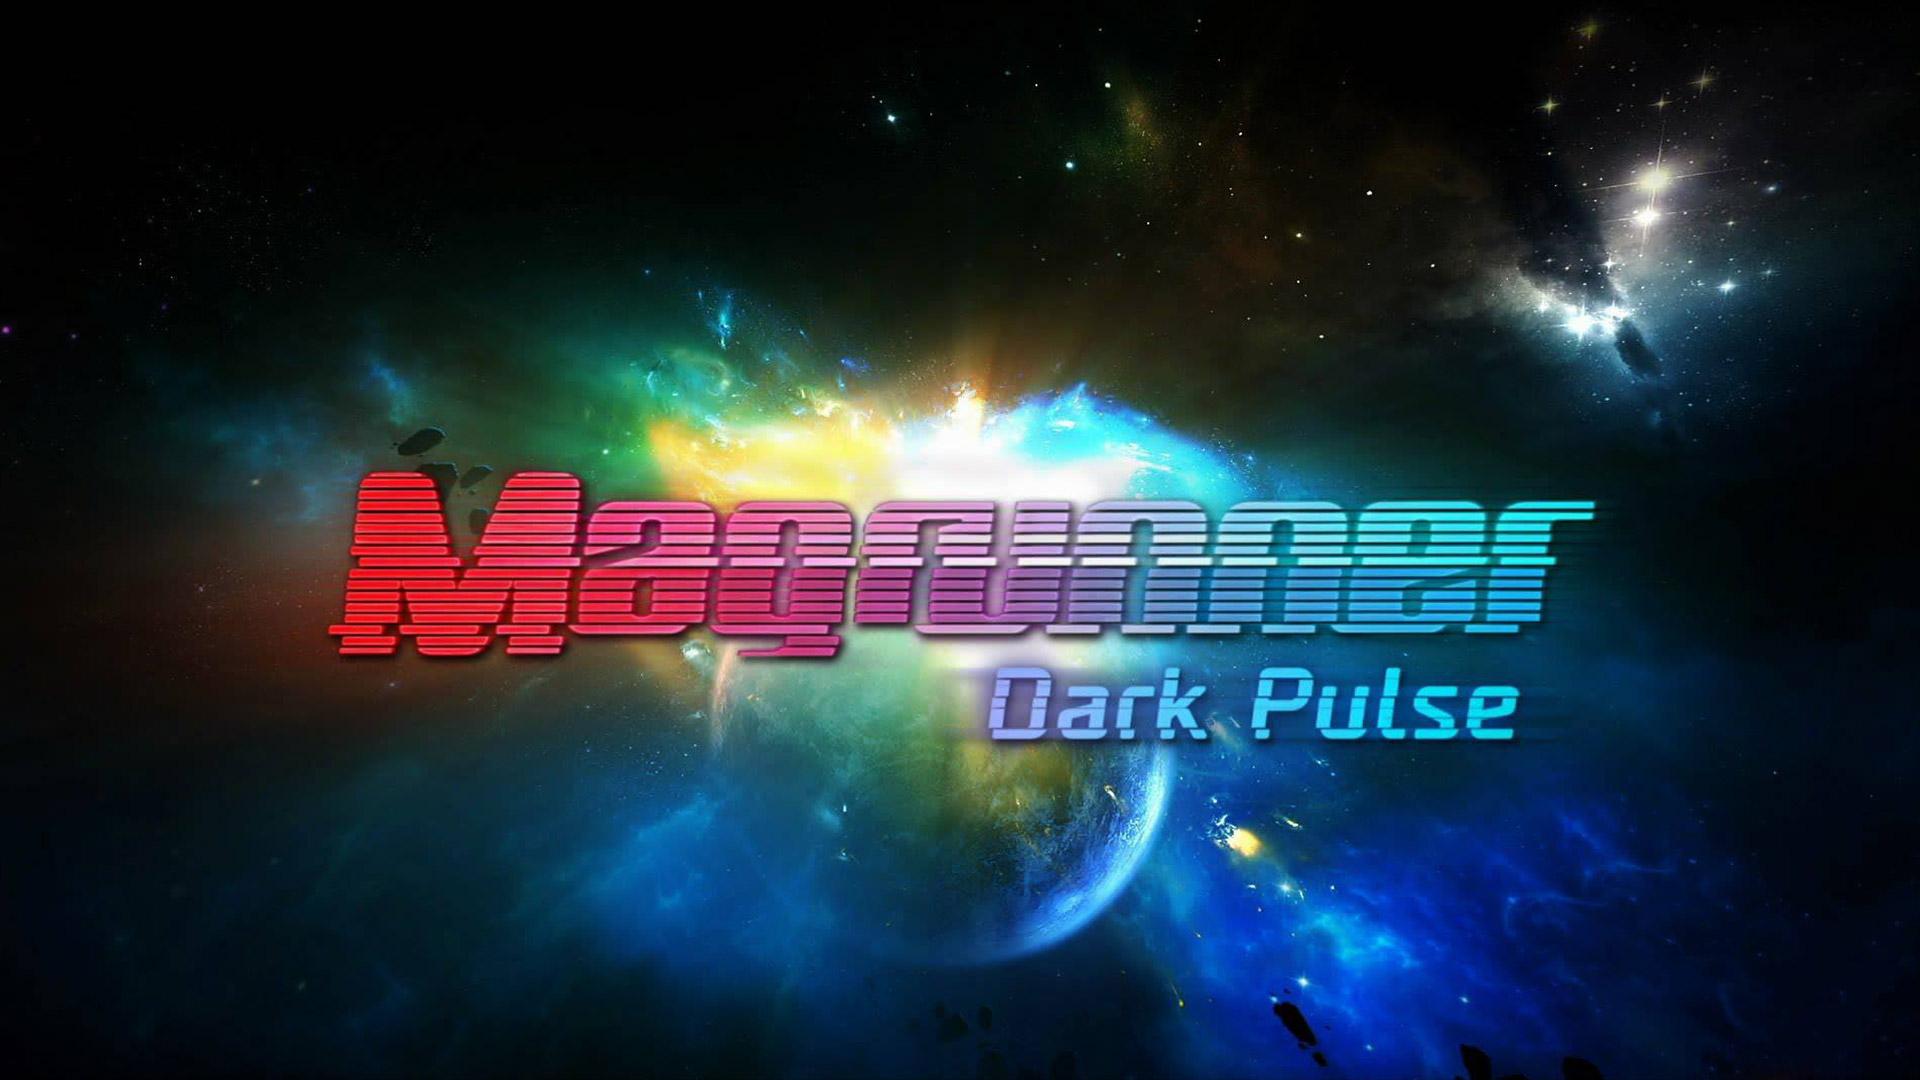 Free Magrunner: Dark Pulse Wallpaper in 1920x1080